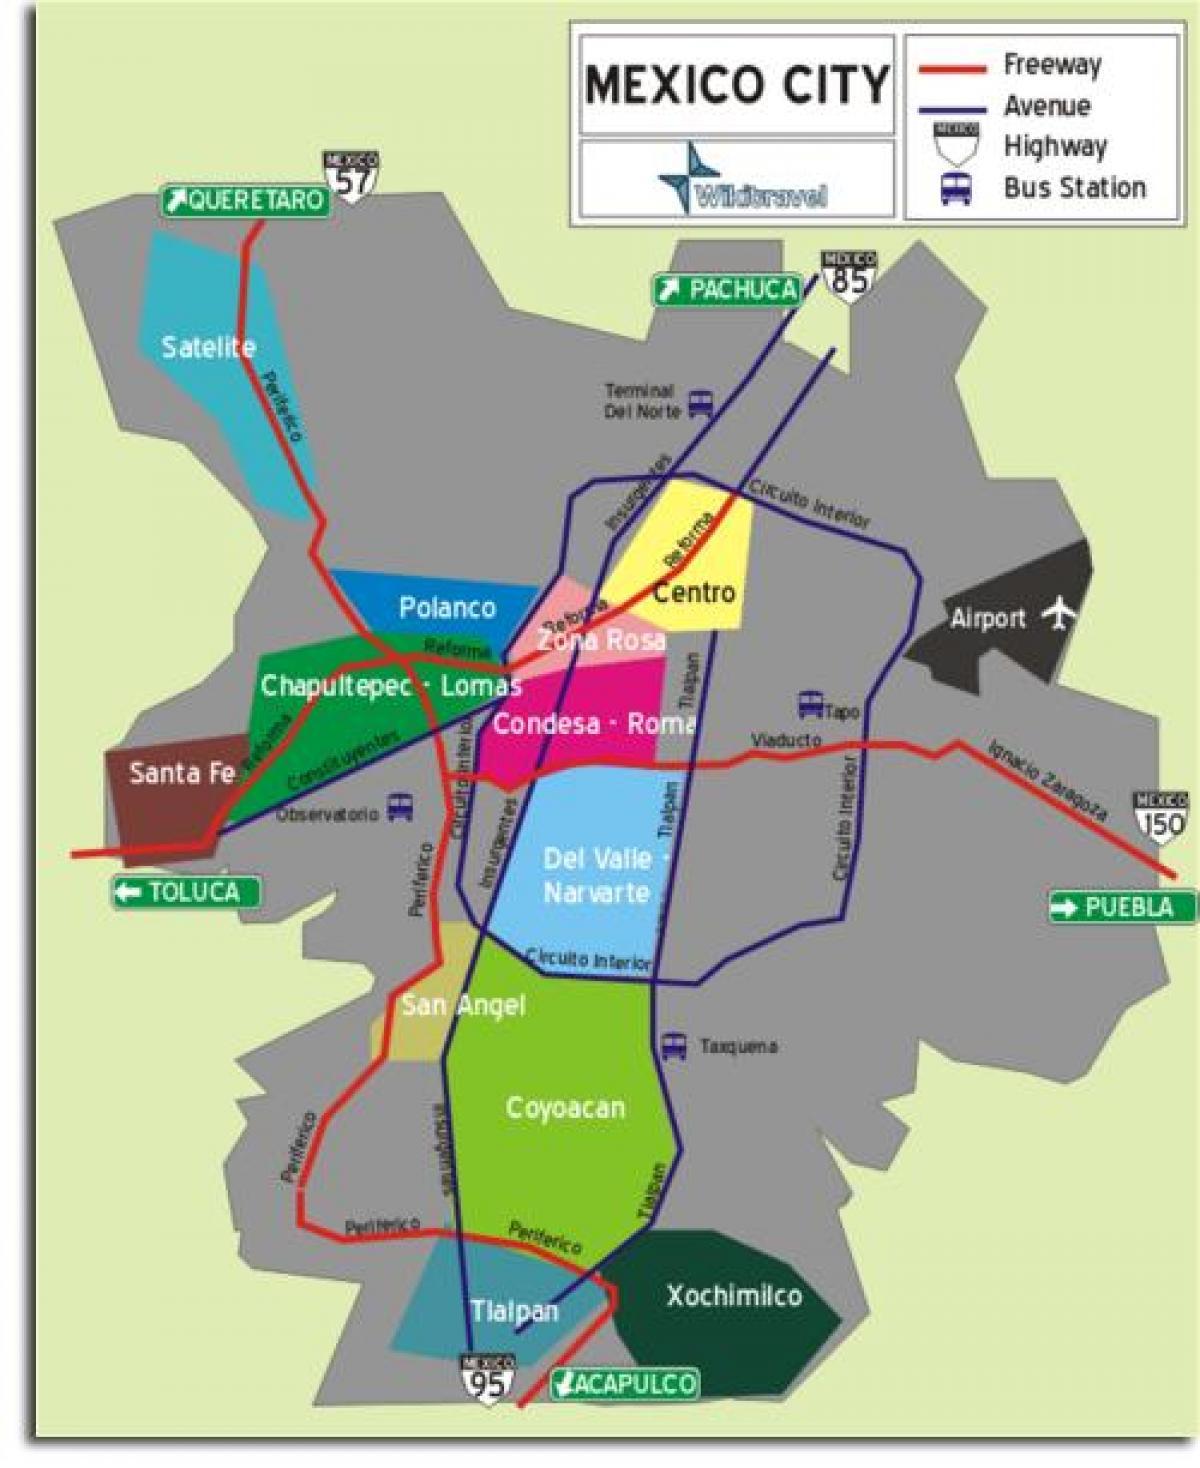 Mexico City neighborhoods map - Mexico City map of